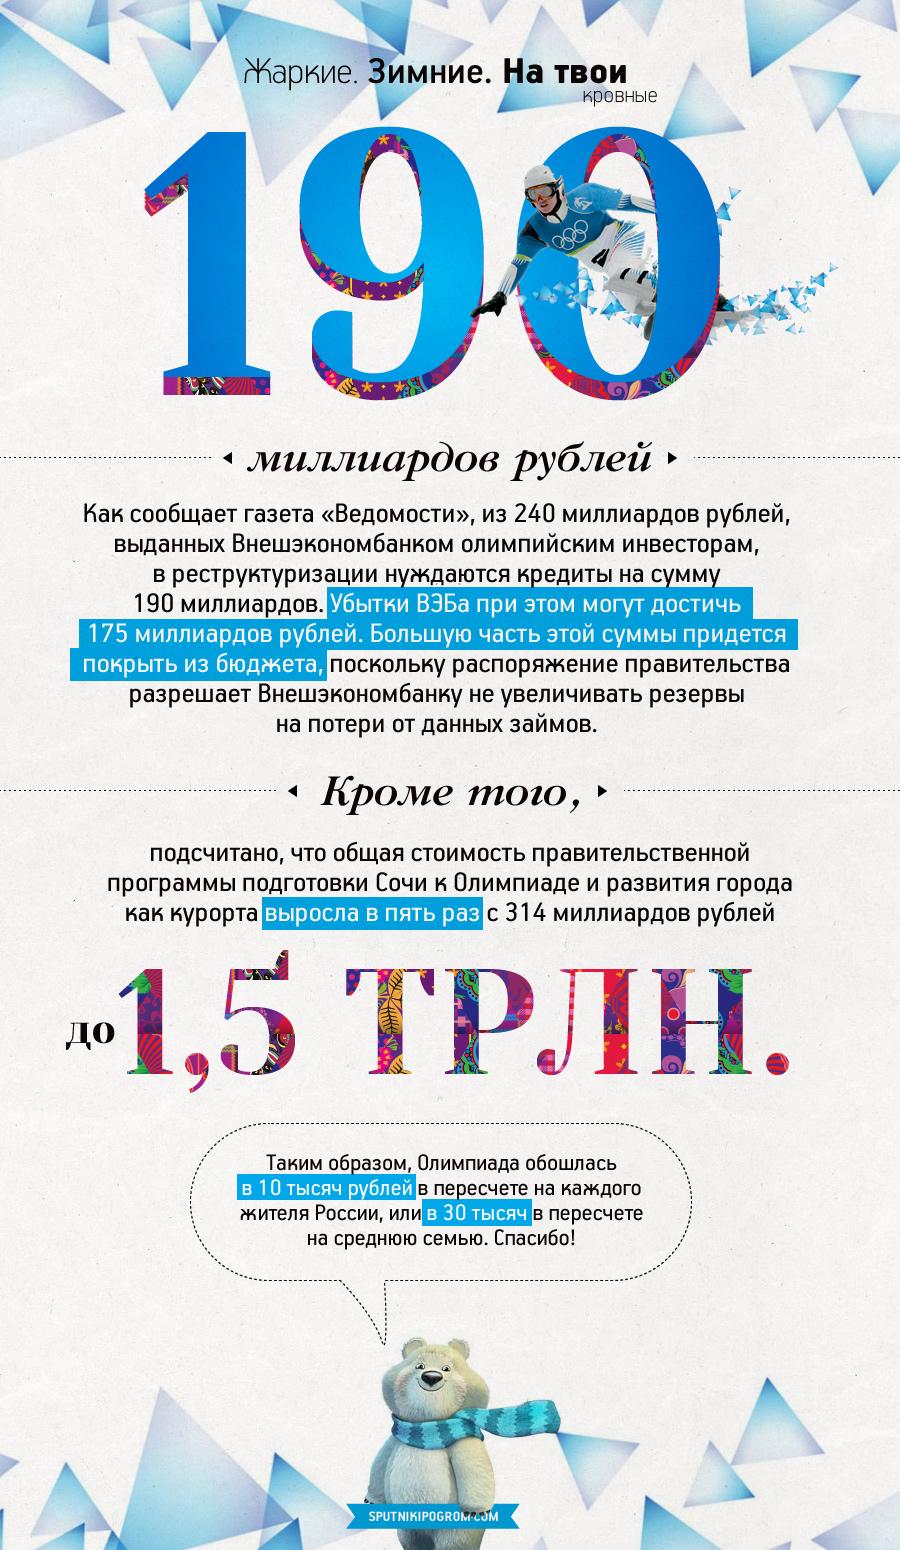 olympics height=1550